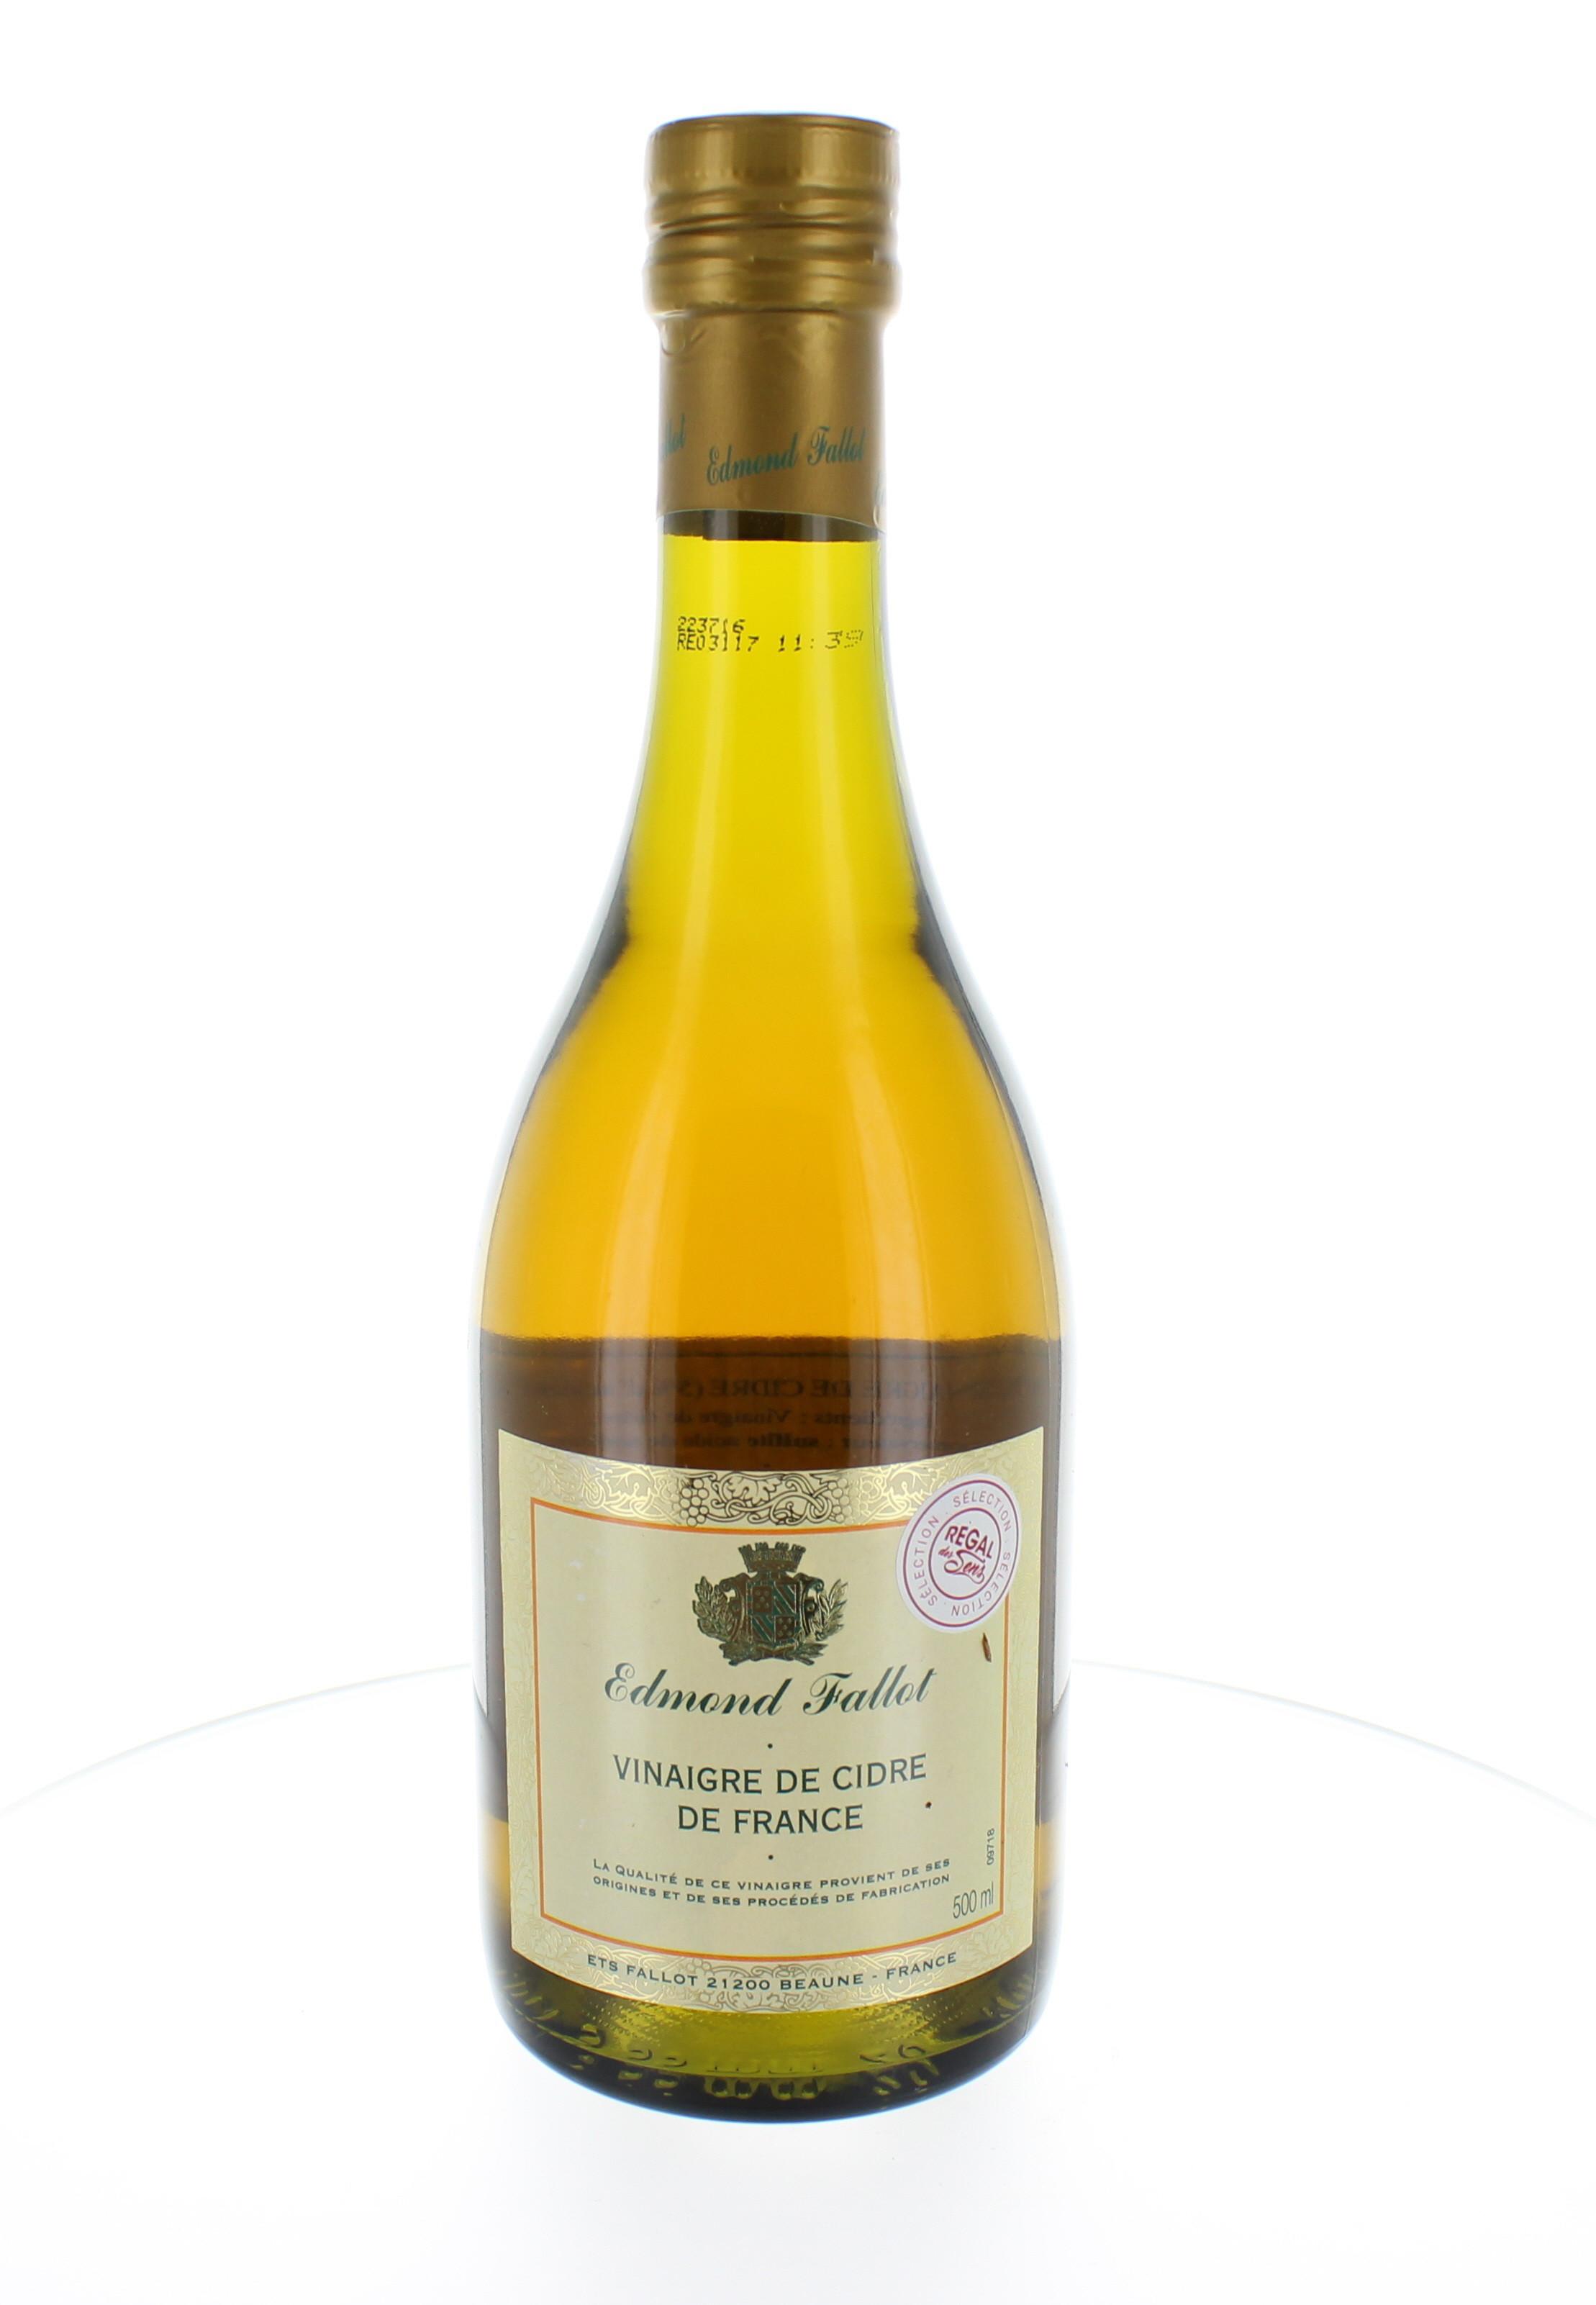 Vinaigre de cidre de France - Regal des Sens